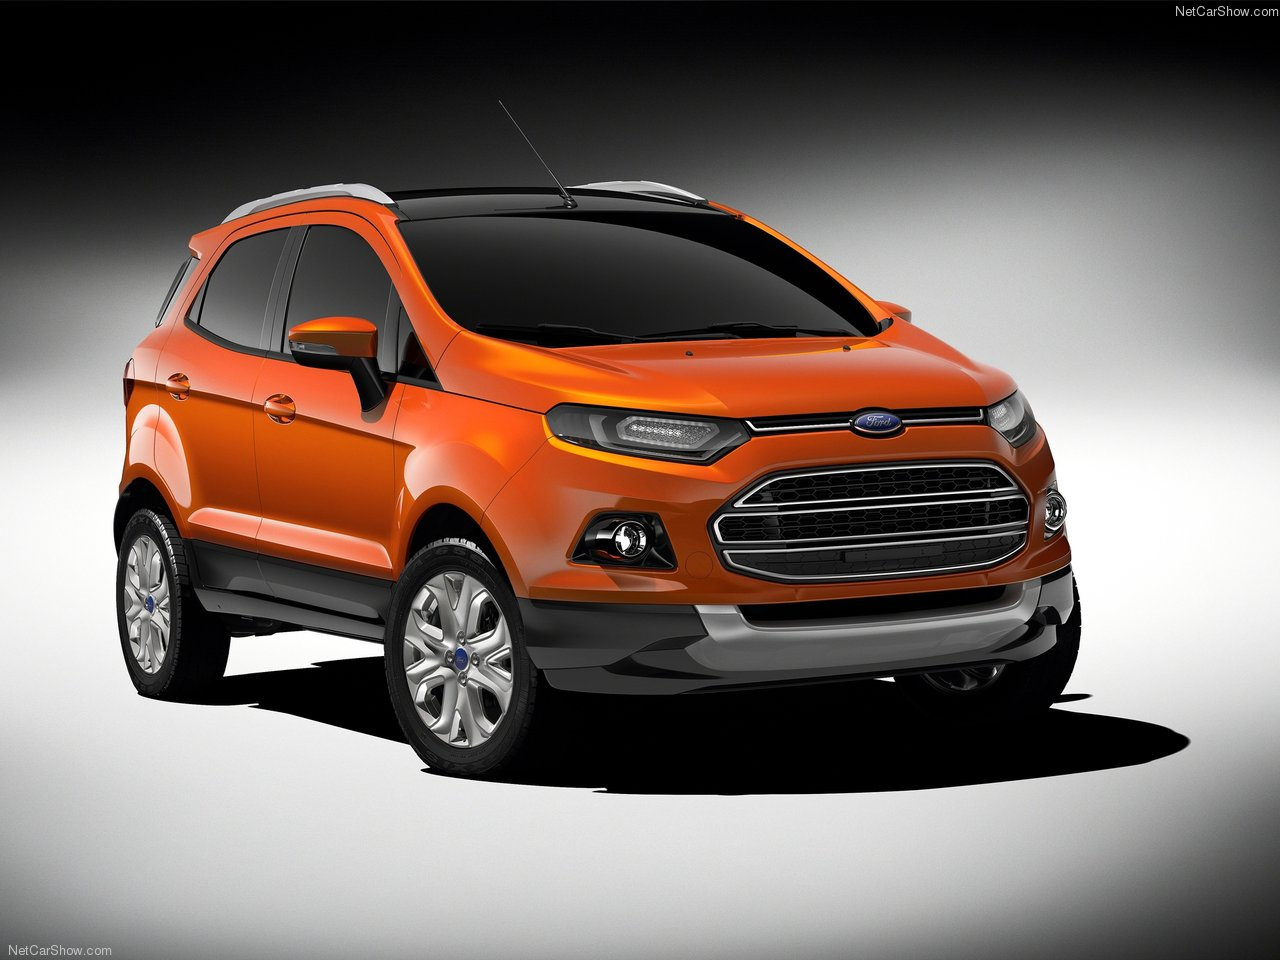 Форд Экоспорт (2016-2017) - фото, цена, характеристики ...